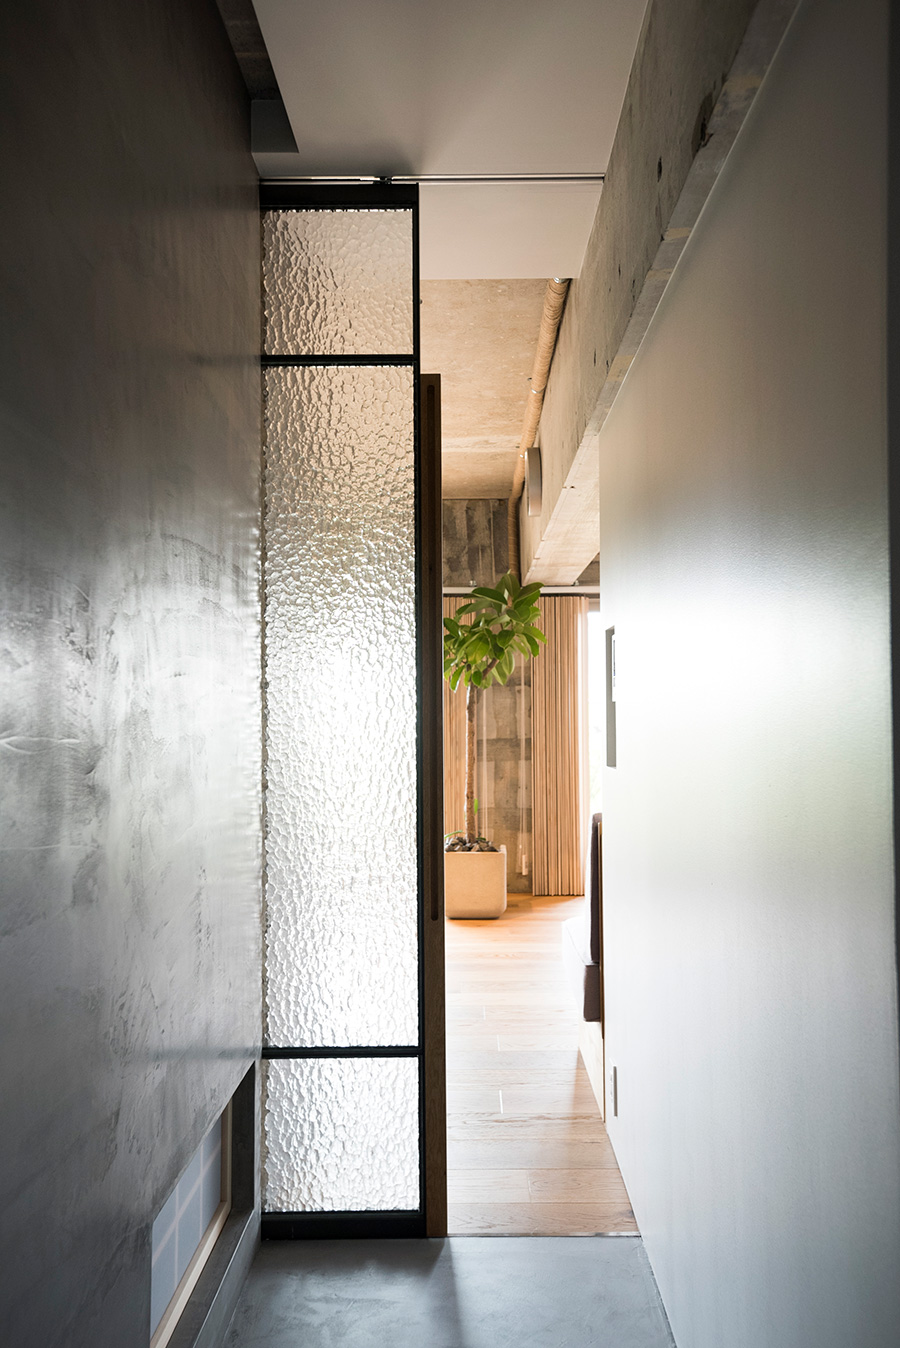 LDKへの入り口は模様の入った型板ガラスの引き戸。バルコニーからの光が通り抜ける。